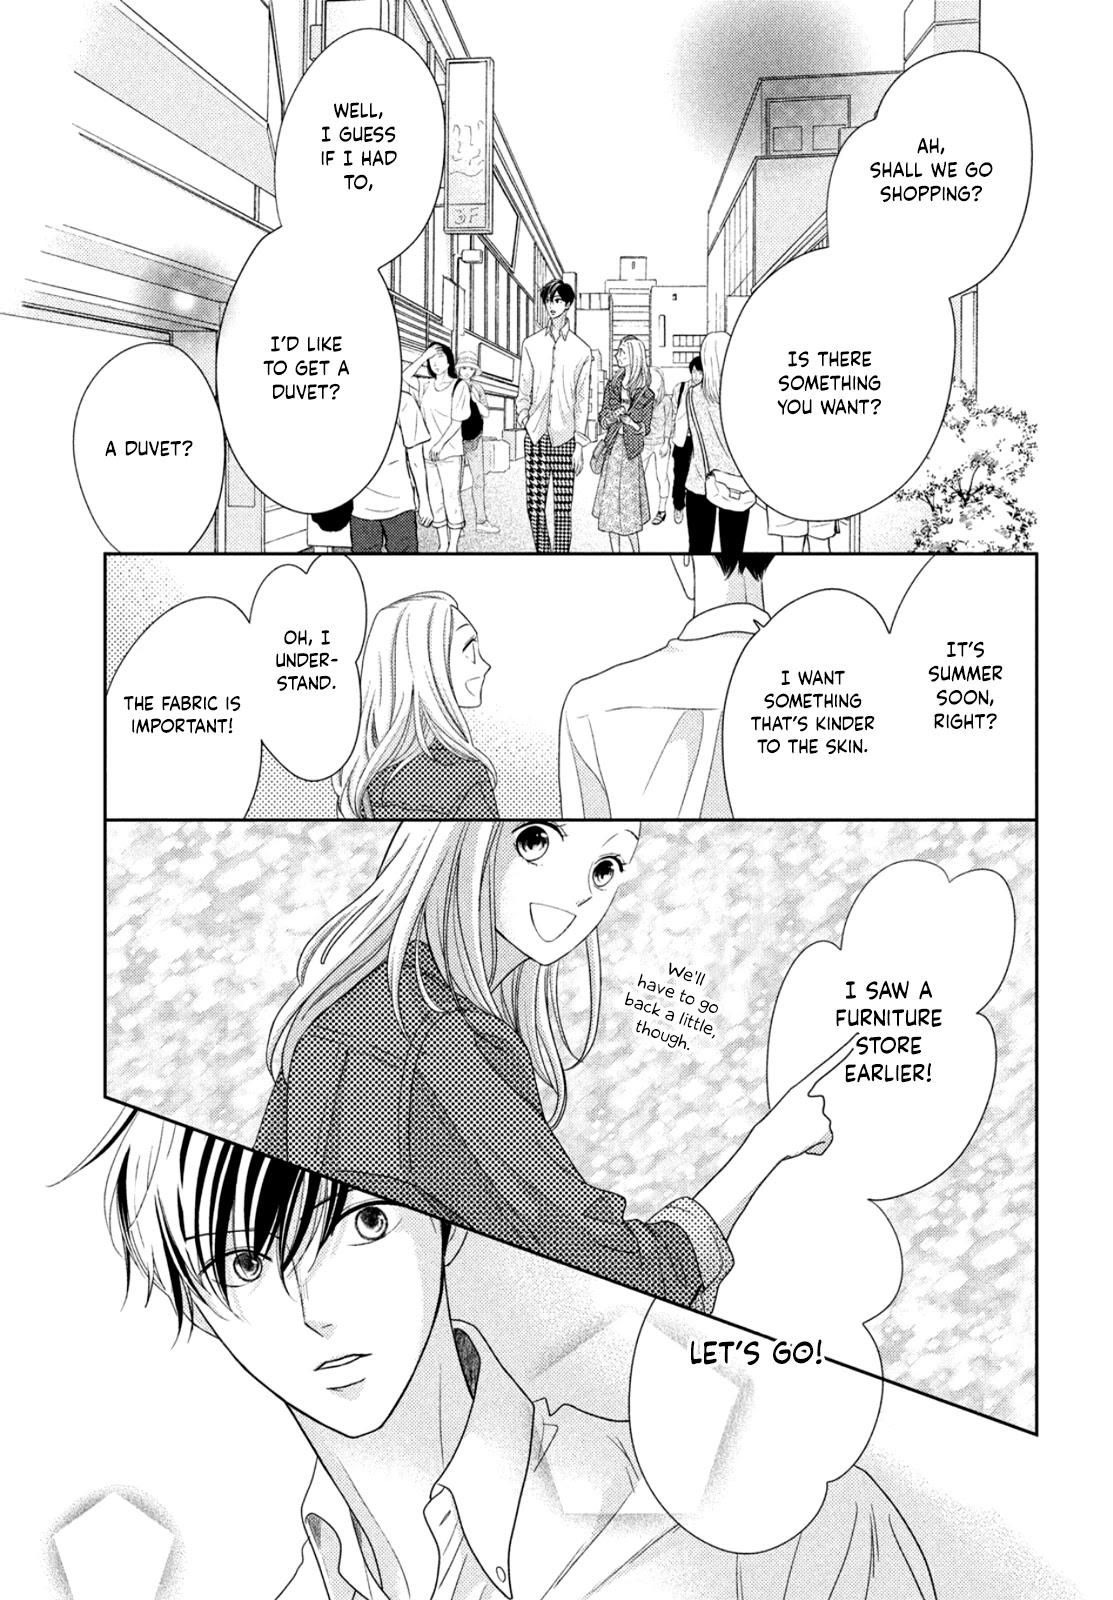 Arashi-Kun No Dakimakura Chapter 7: Because We're The Same page 19 - Mangakakalots.com